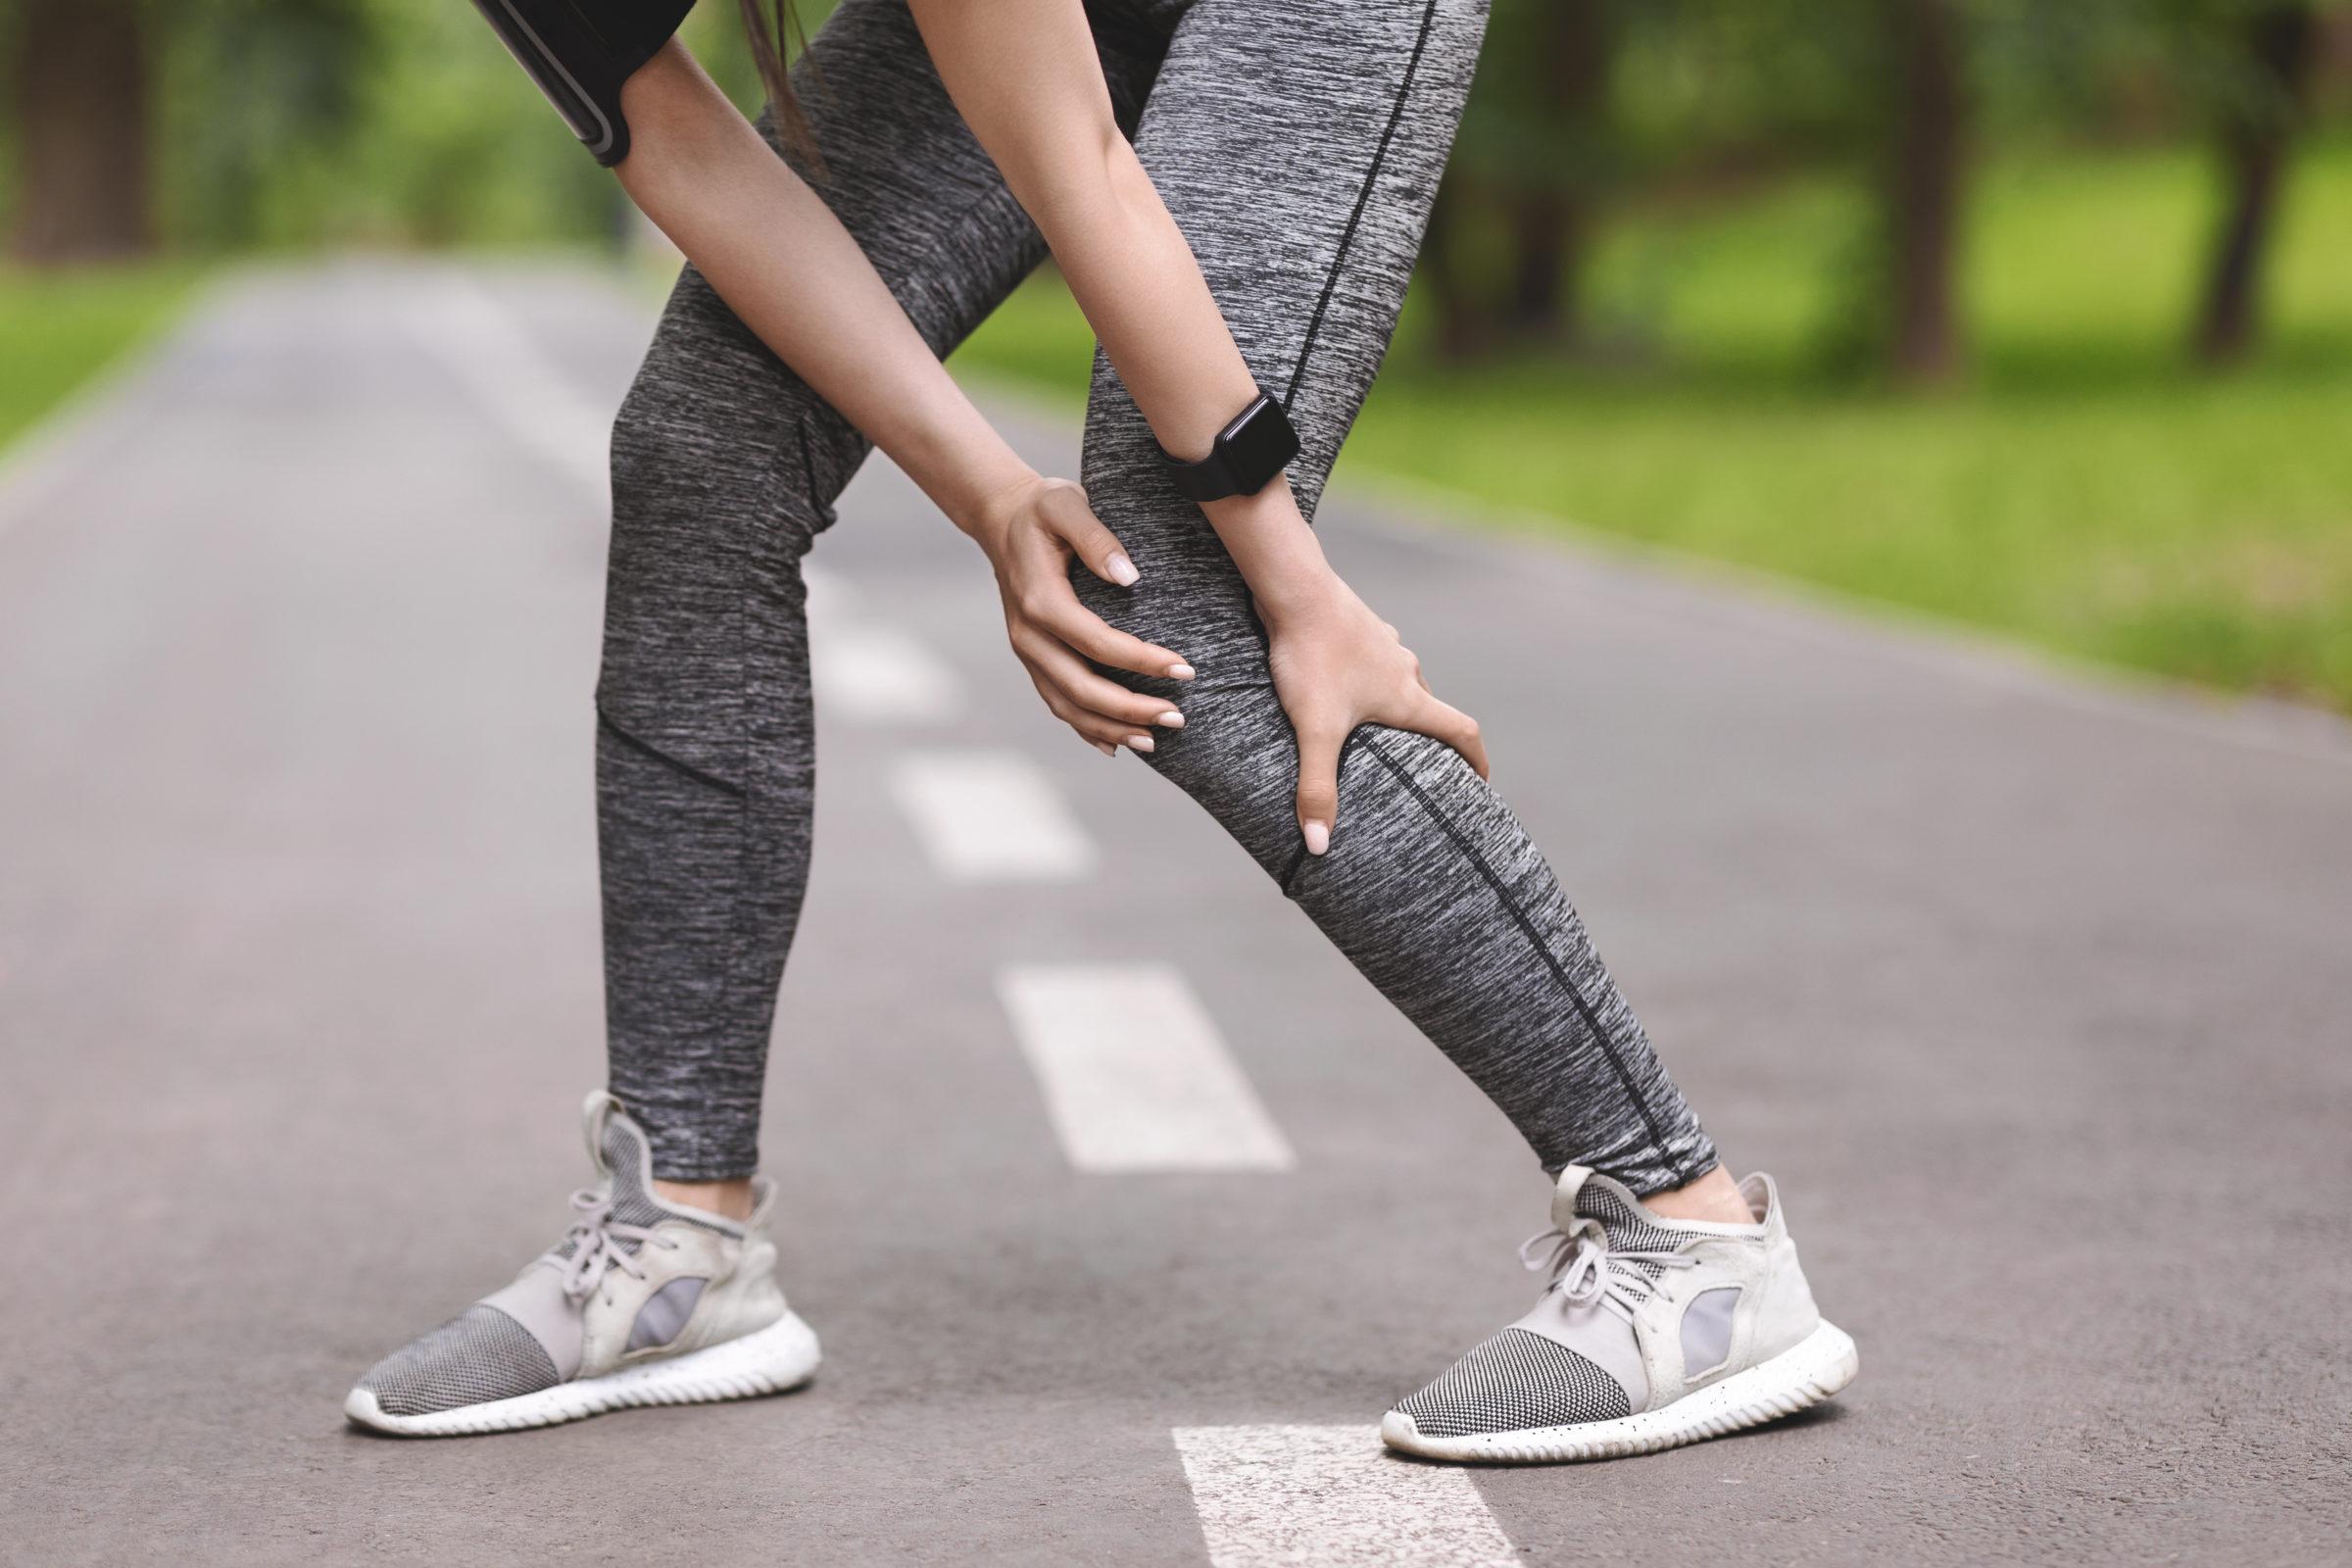 calf injury sporty woman massaging leg having musc 3WPC8X7